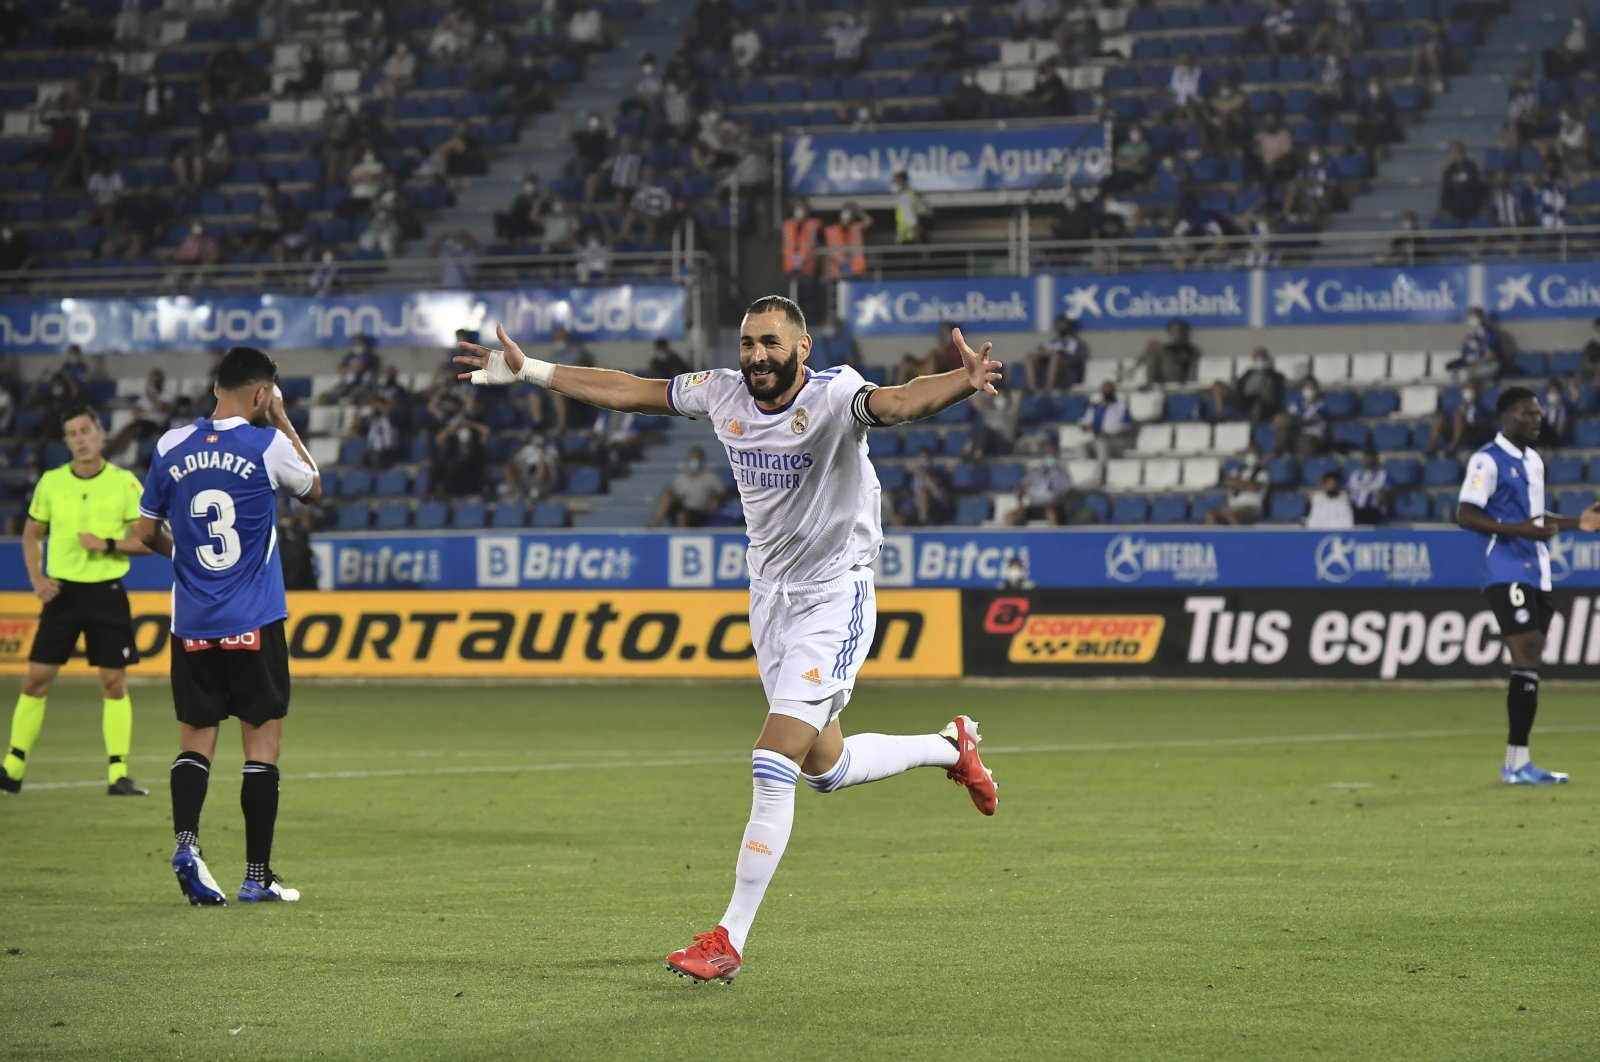 Real Madrid's Karim Benzema celebrates scoring his side's third goal during a Spanish La Liga match against Alaves at the Mendizorroza stadium in Vitoria, Spain, Aug. 14, 2021. (AP Photo)